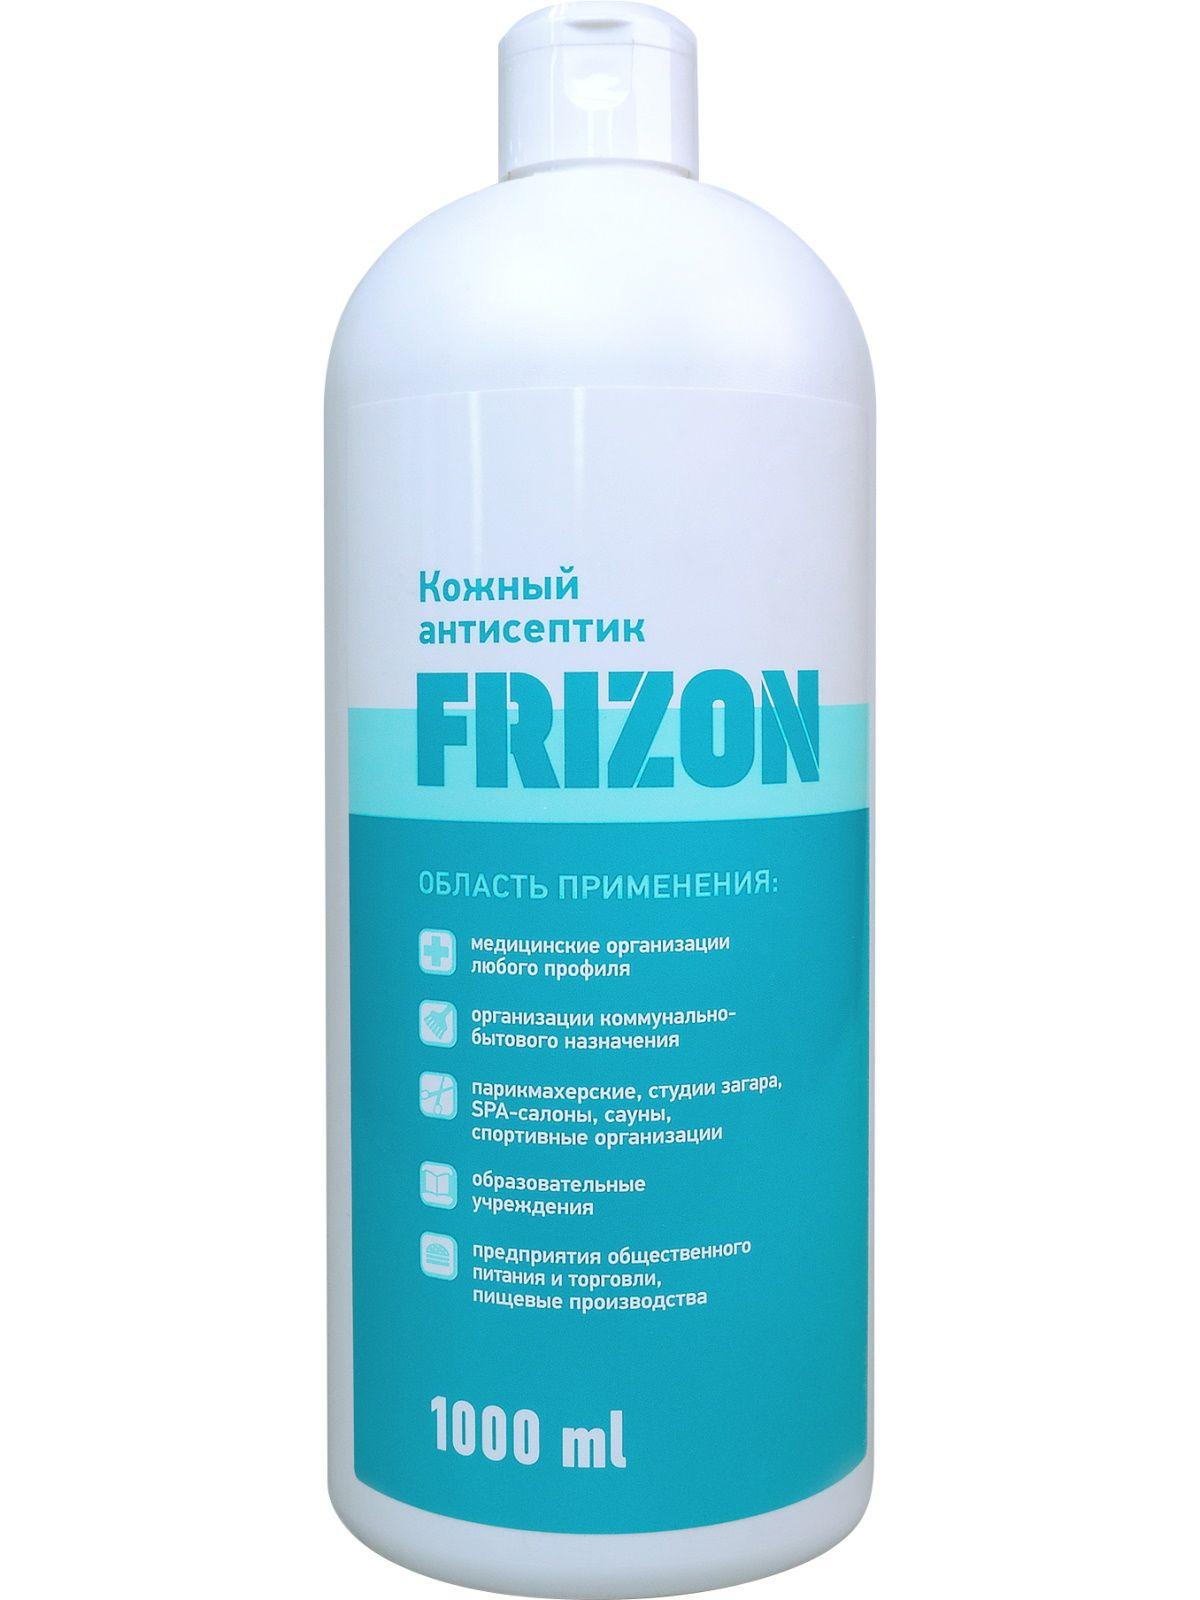 Купить Средство для дезинфекции FRIZON кожный антисептик 1000 мл